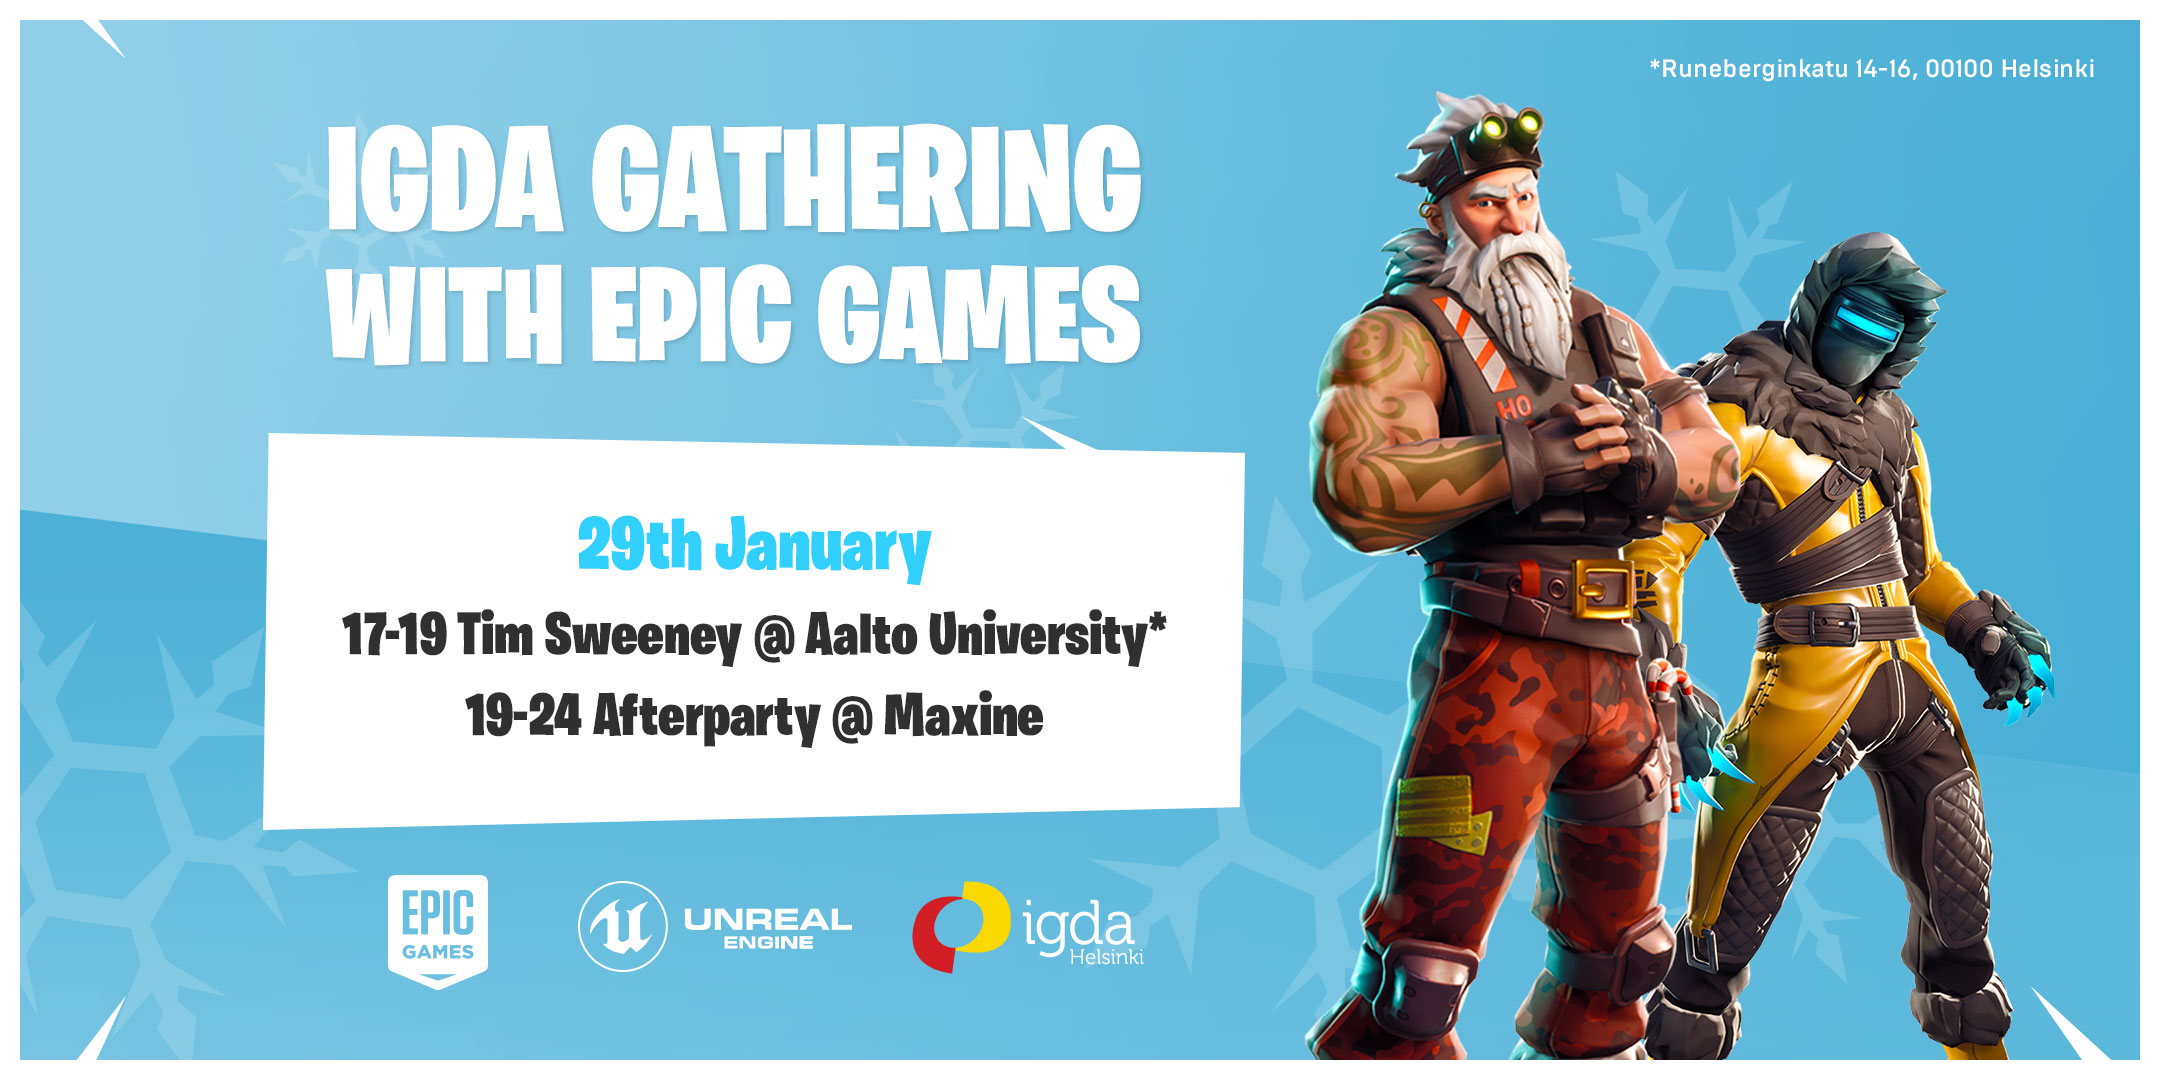 2160x1080_IGDA_Epic_banner_eventbrite.jpg